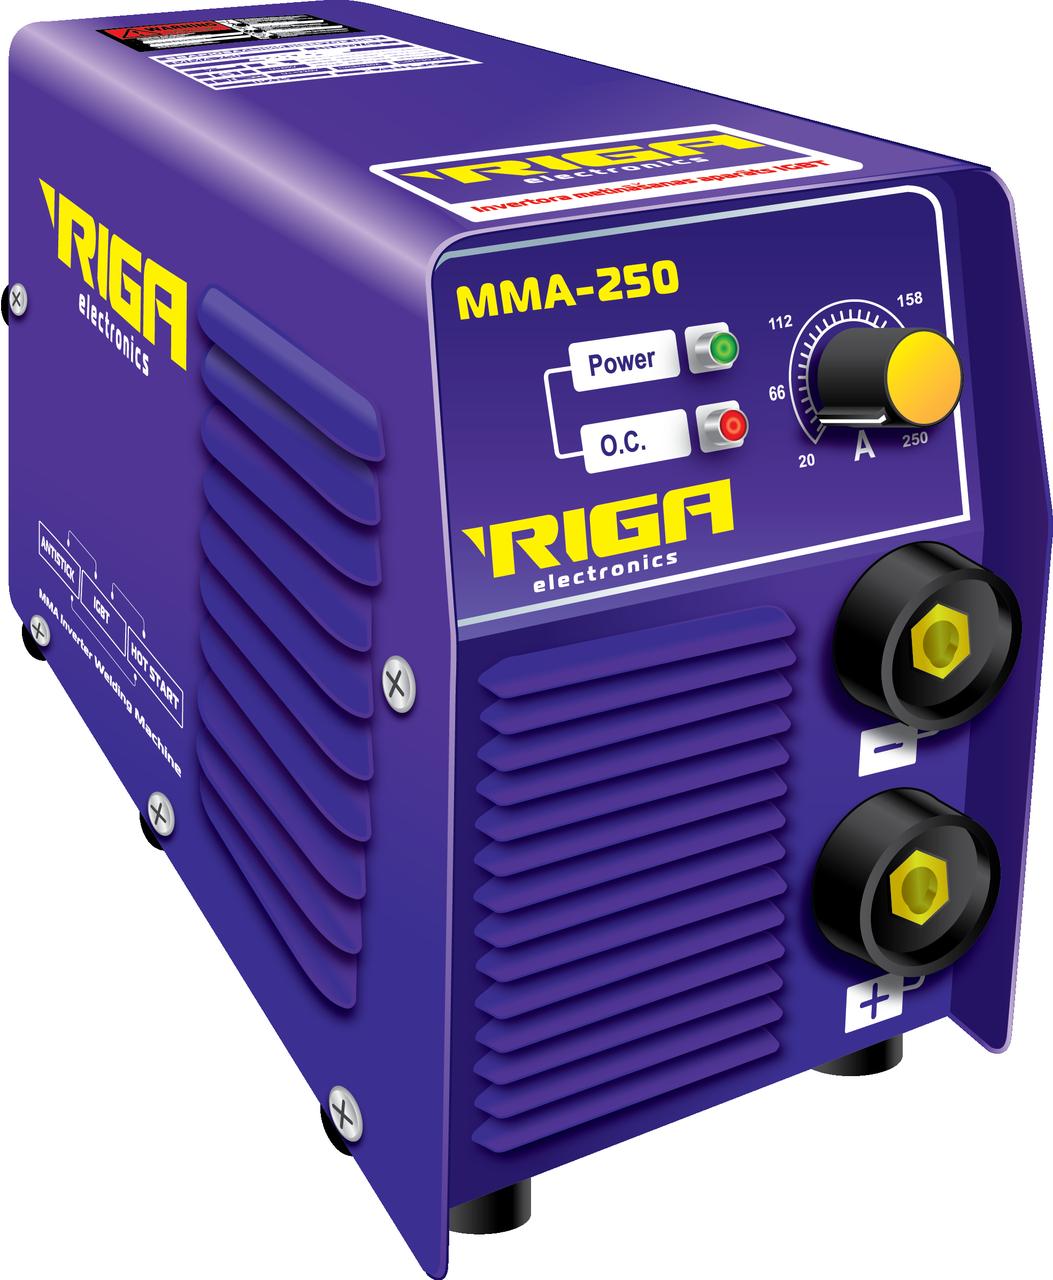 Сварочный инвертор RIGA mini ММА 250 (70974002)